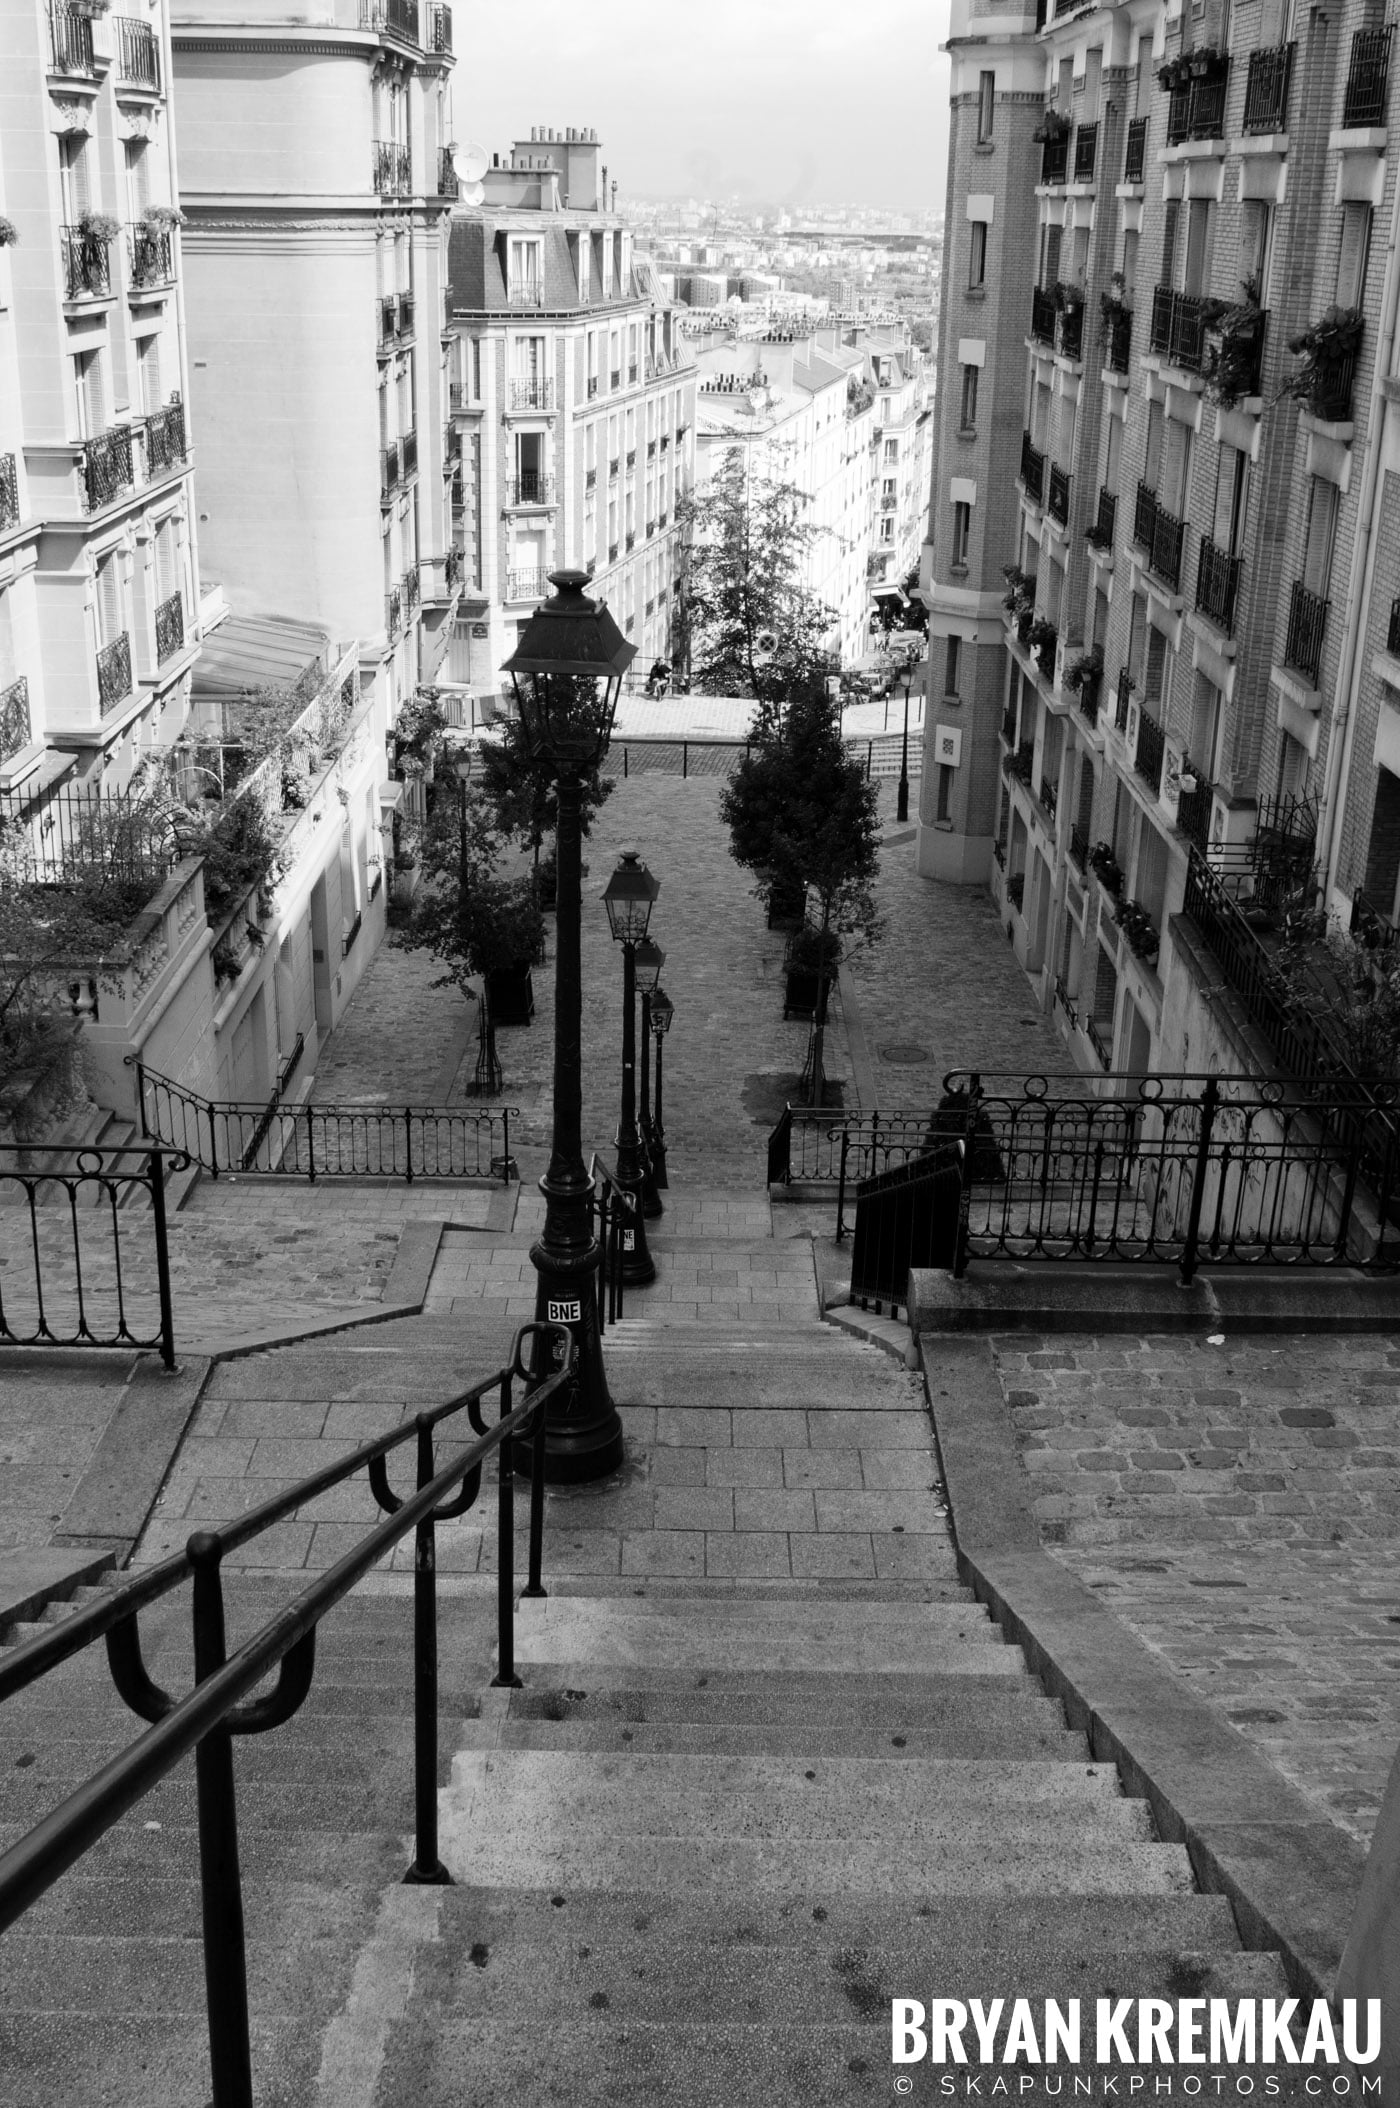 Paris, France Honeymoon - Day 6 - 7.23.11 (31)